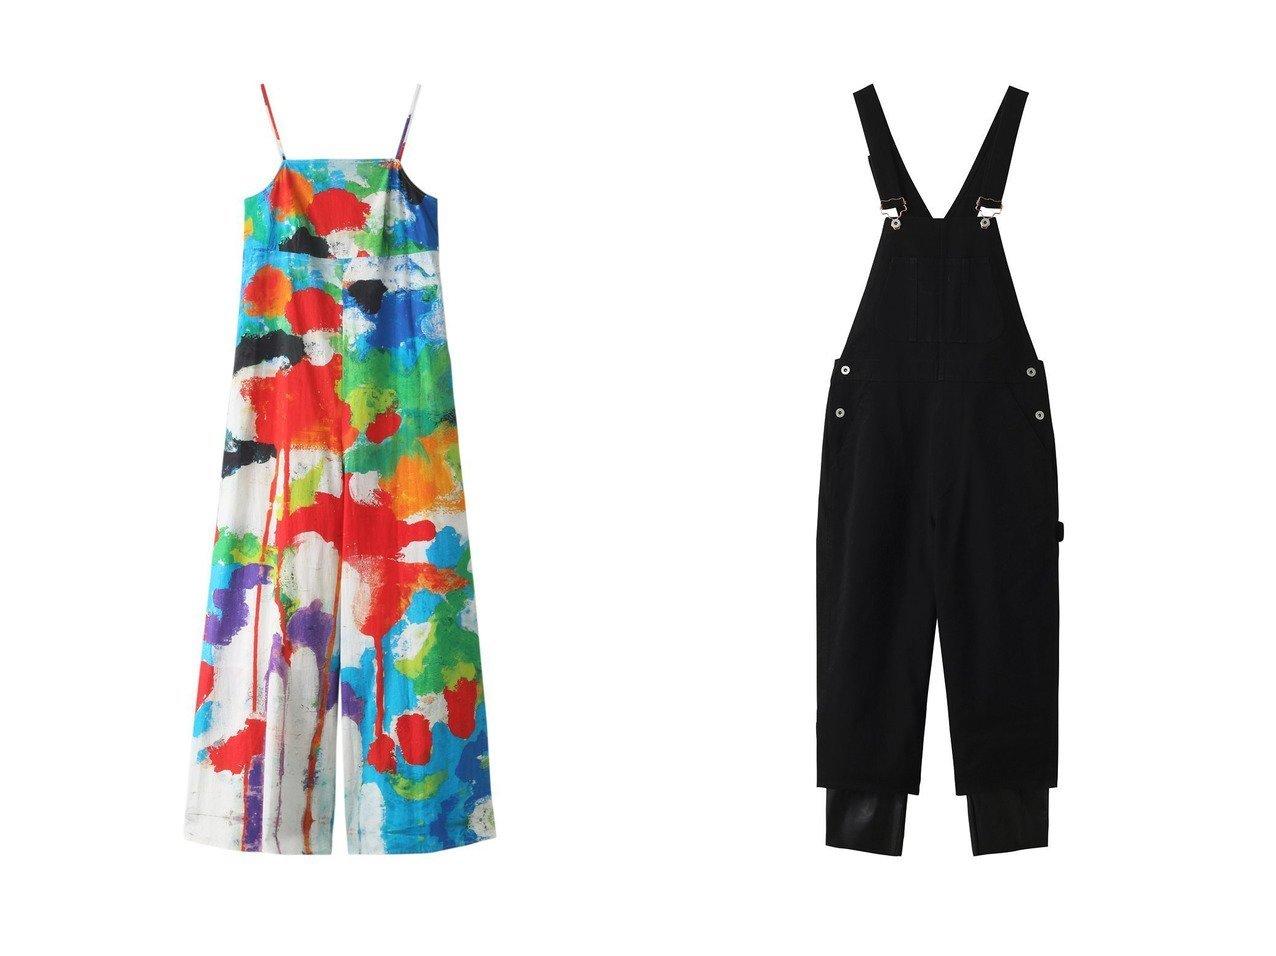 【nagonstans/ナゴンスタンス】のレイヤード オーバーオール R-05&Boiling Sun キャミフレアオールインワン 【ワンピース・ドレス】おすすめ!人気、トレンド・レディースファッションの通販 おすすめで人気の流行・トレンド、ファッションの通販商品 メンズファッション・キッズファッション・インテリア・家具・レディースファッション・服の通販 founy(ファニー) https://founy.com/ ファッション Fashion レディースファッション WOMEN パンツ Pants エレガント キャミソール フレア プリント ボトム 今季 トレンド ベーシック ロング  ID:crp329100000035559